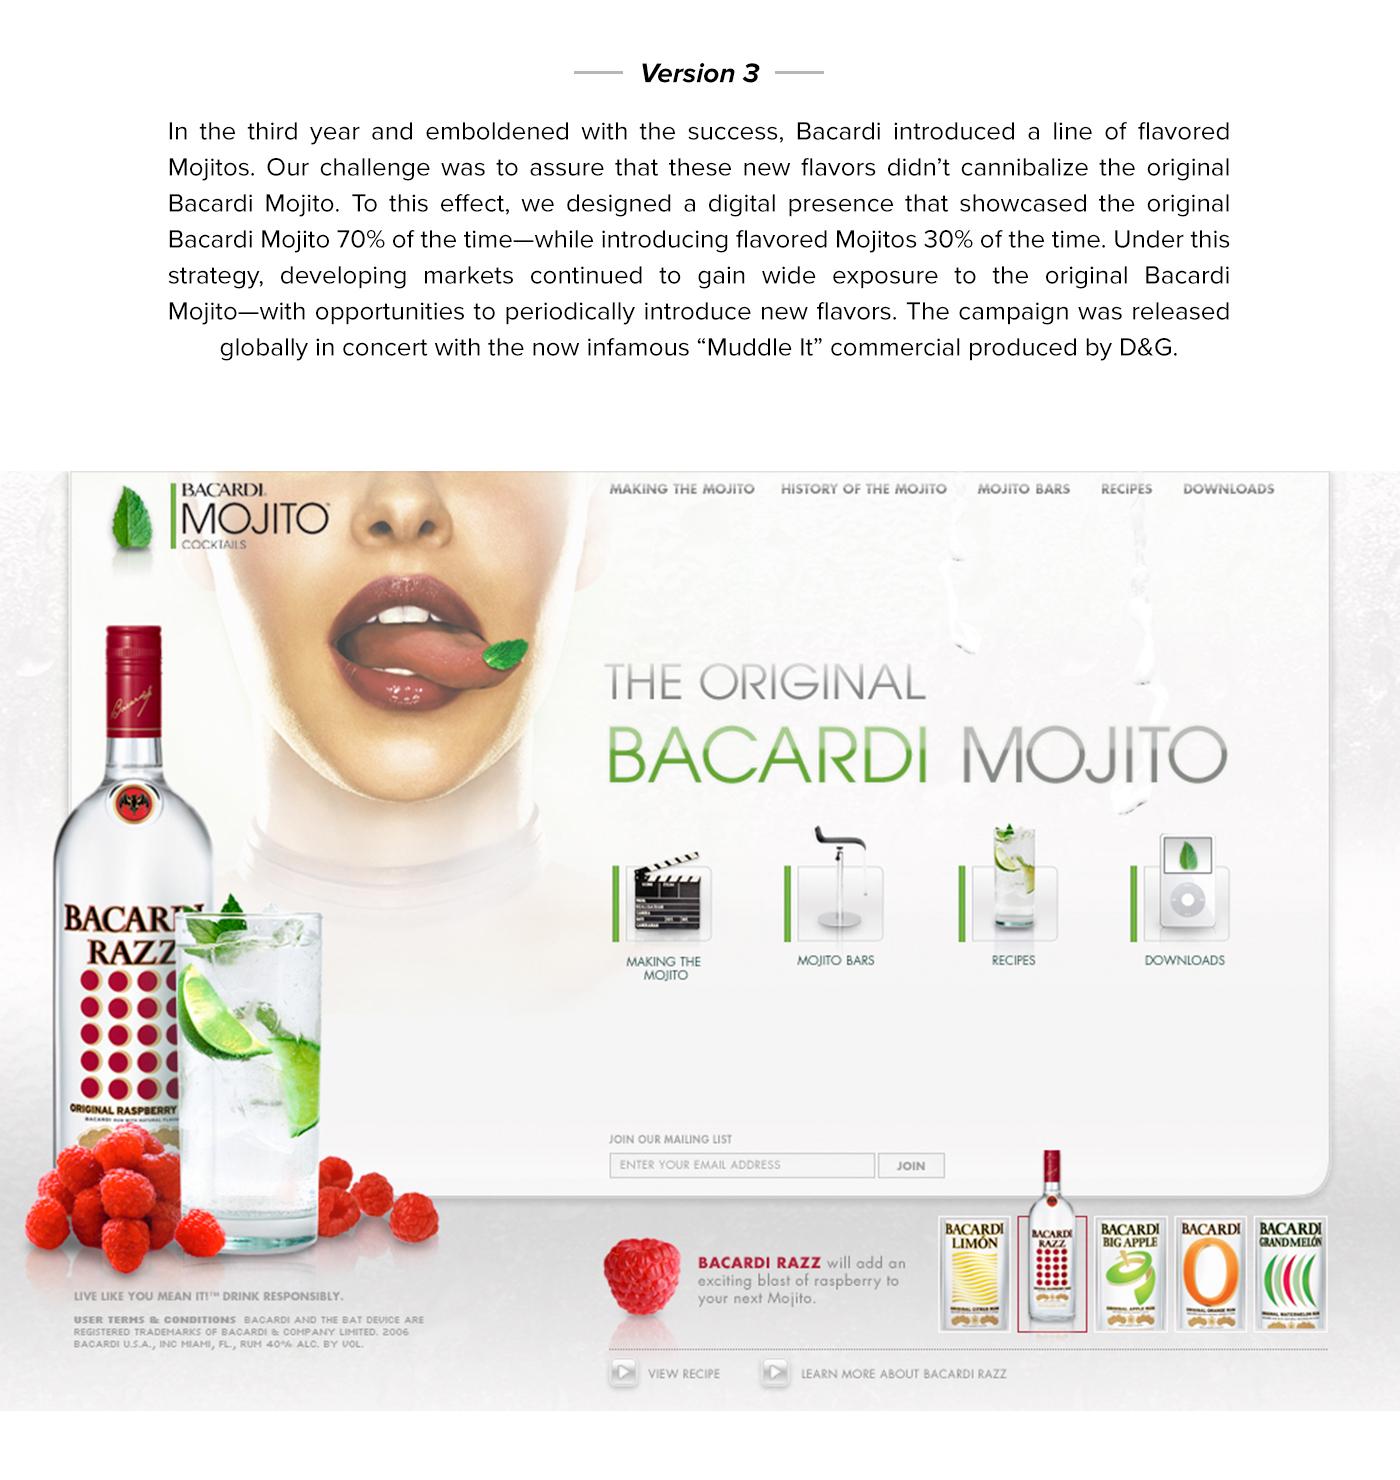 bacardi mojito Bacardi Mojito Rum cocktails